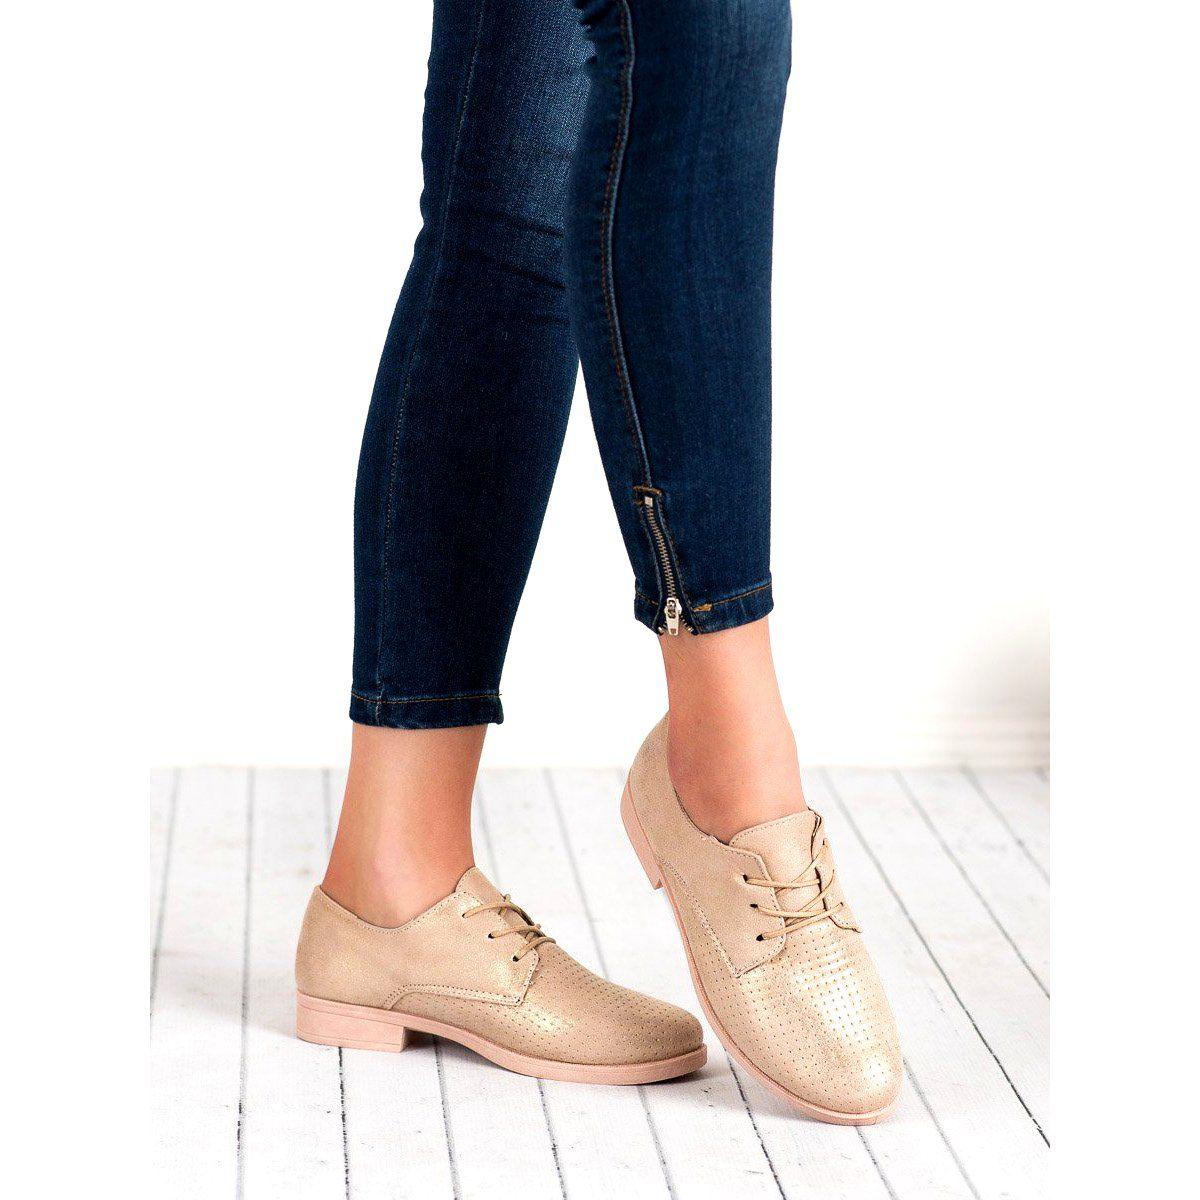 Bless Eleganckie Polbuty Damskie Zolte Oxford Shoes Womens Oxfords Shoes